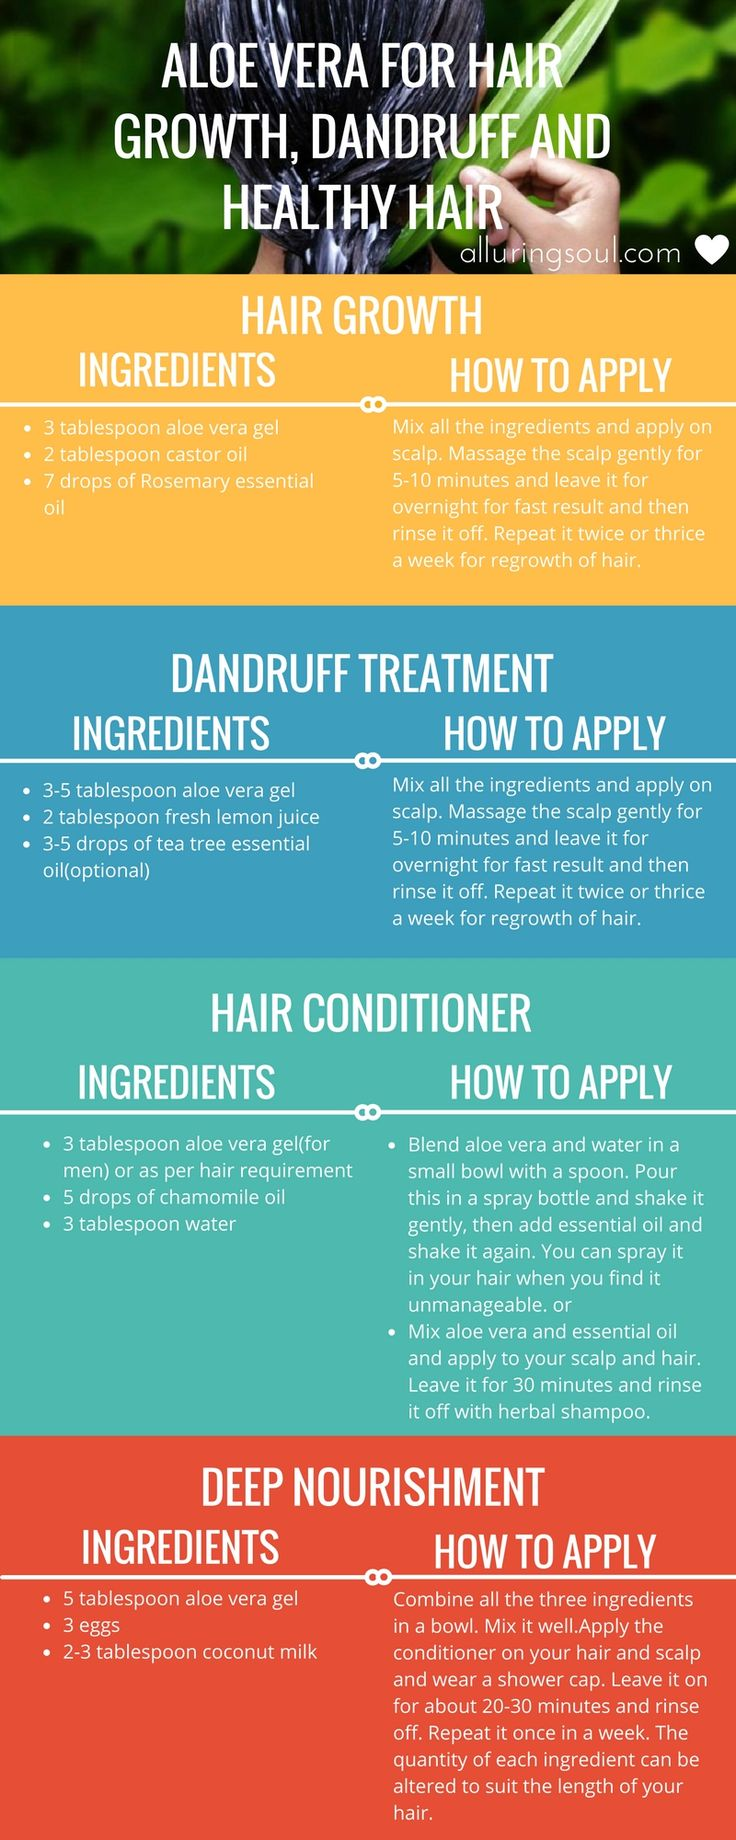 aloe vera hair mask for healthy and dandruff free hair